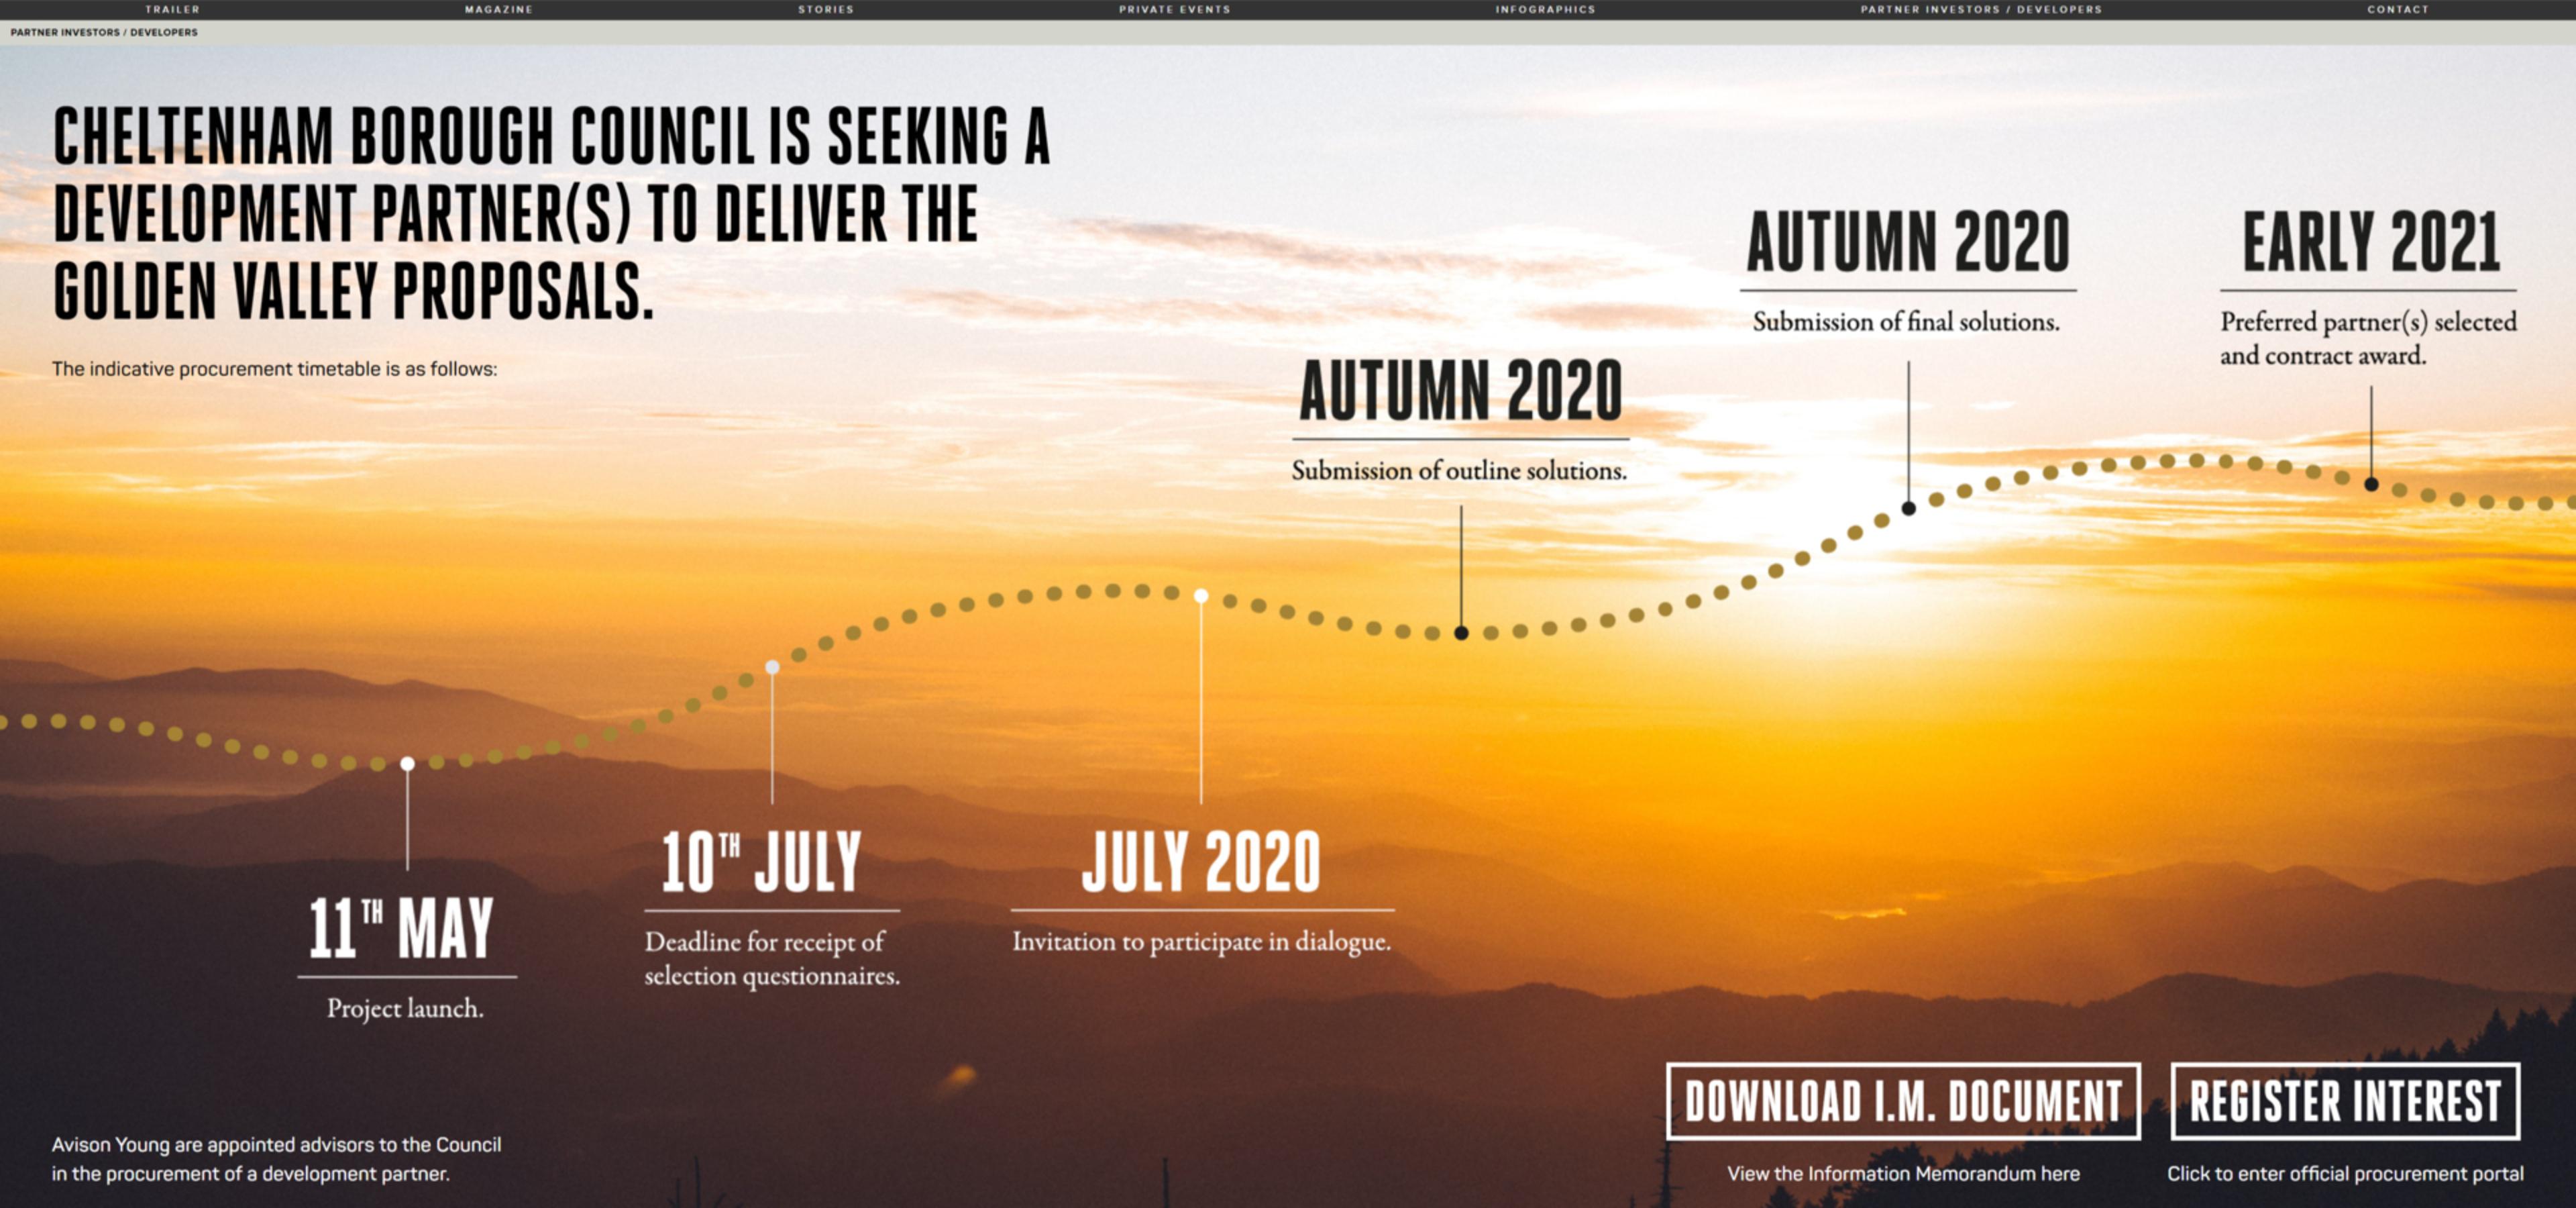 Golden Valley Development   Cyber Central UK   Website Build 2020   Tang Marketing